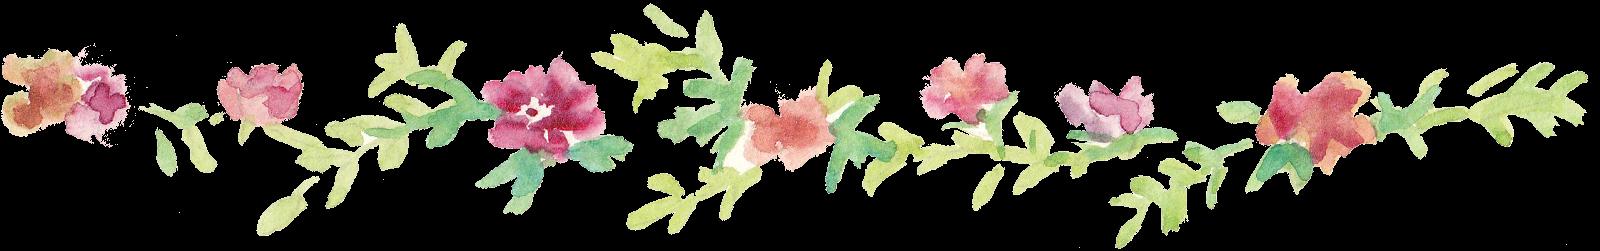 Line Art Flowers Png : Kaskus cendokur bareng regional jakarta page